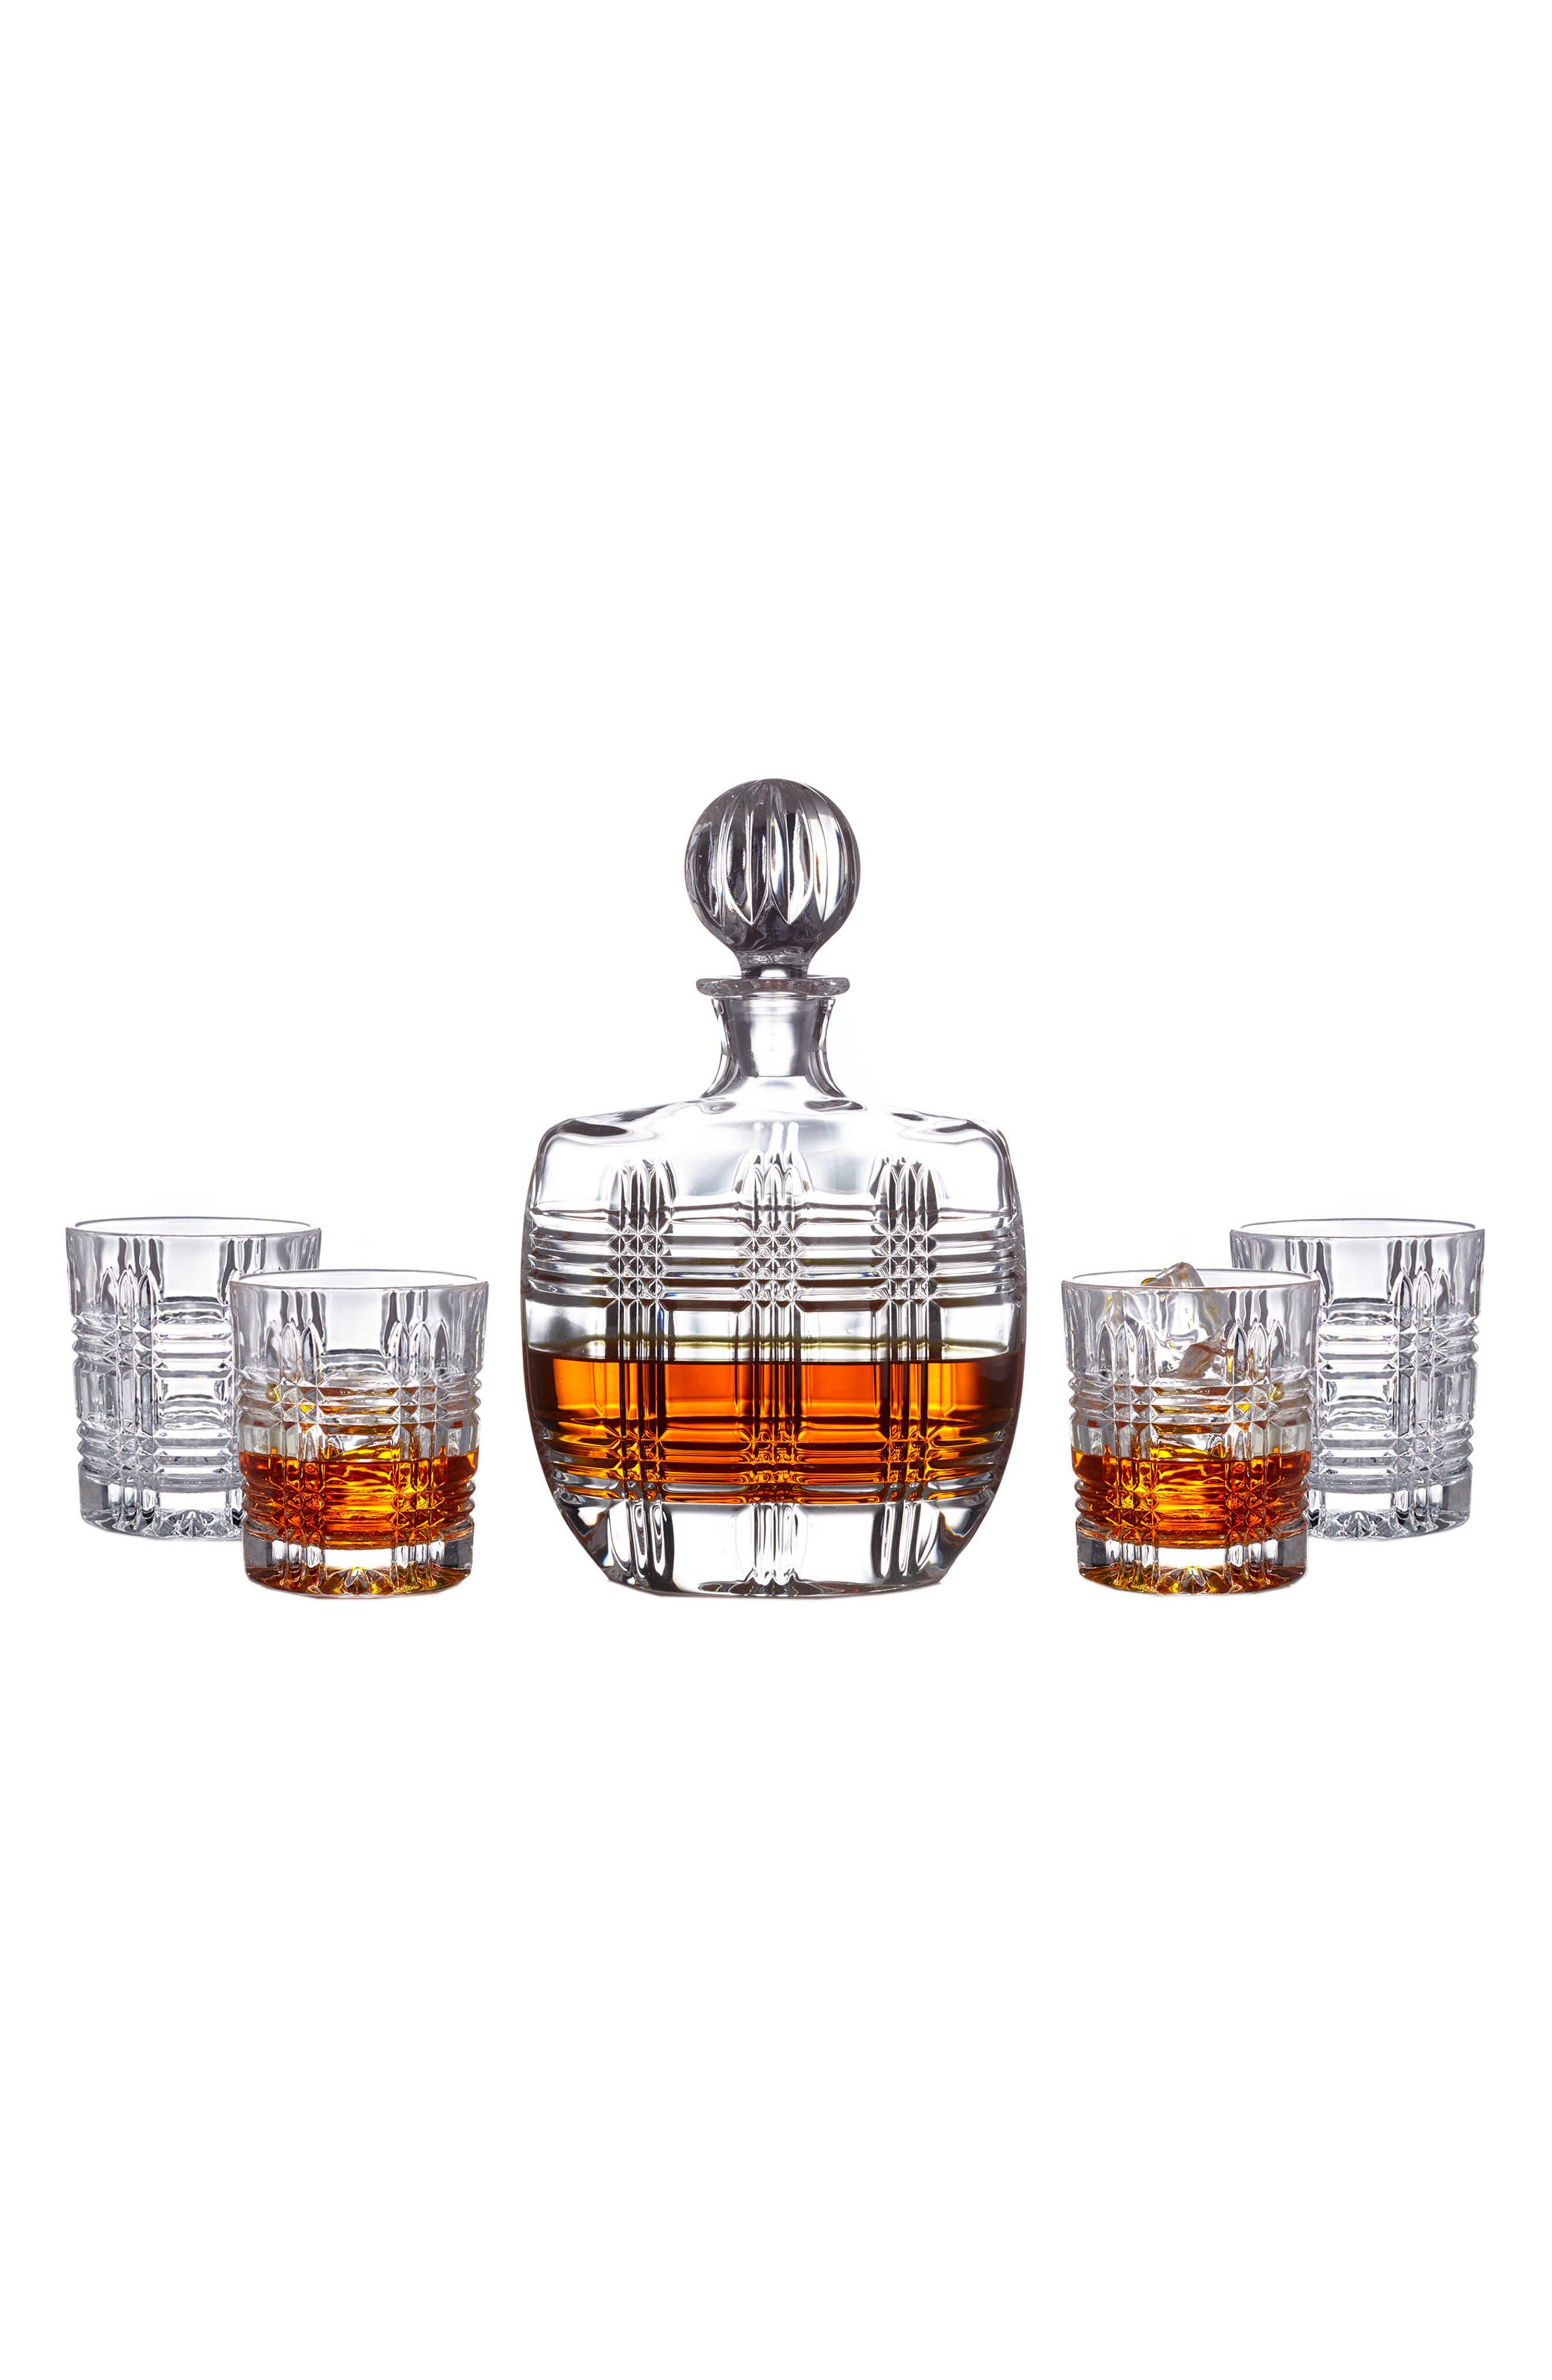 Bridgeport 5-Piece Decanter & Whiskey Glasses Set,                             Alternate thumbnail 3, color,                             100